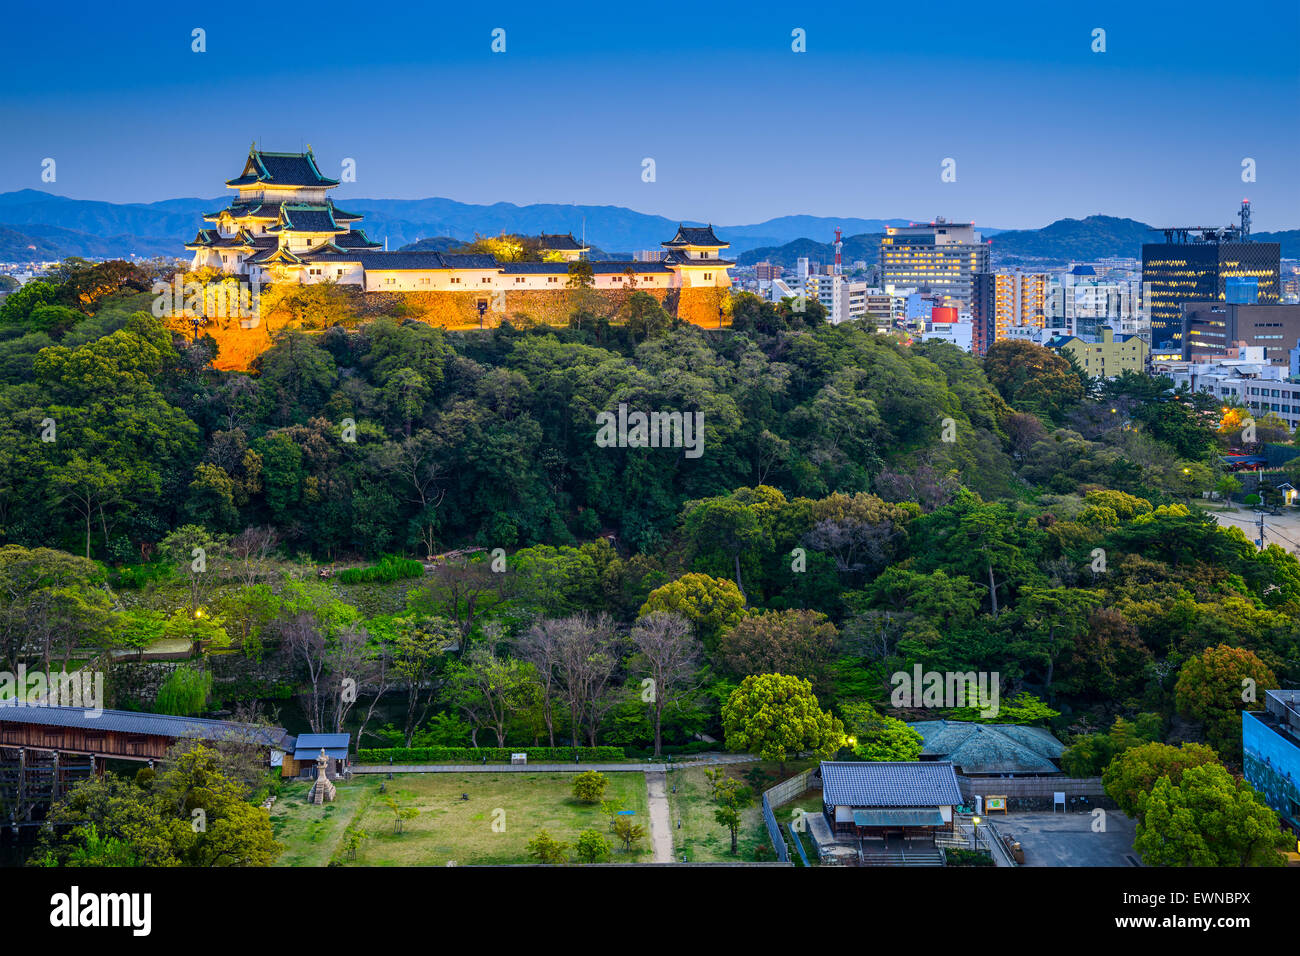 Wakayama, Japan Castle and downtown cityscape. - Stock Image